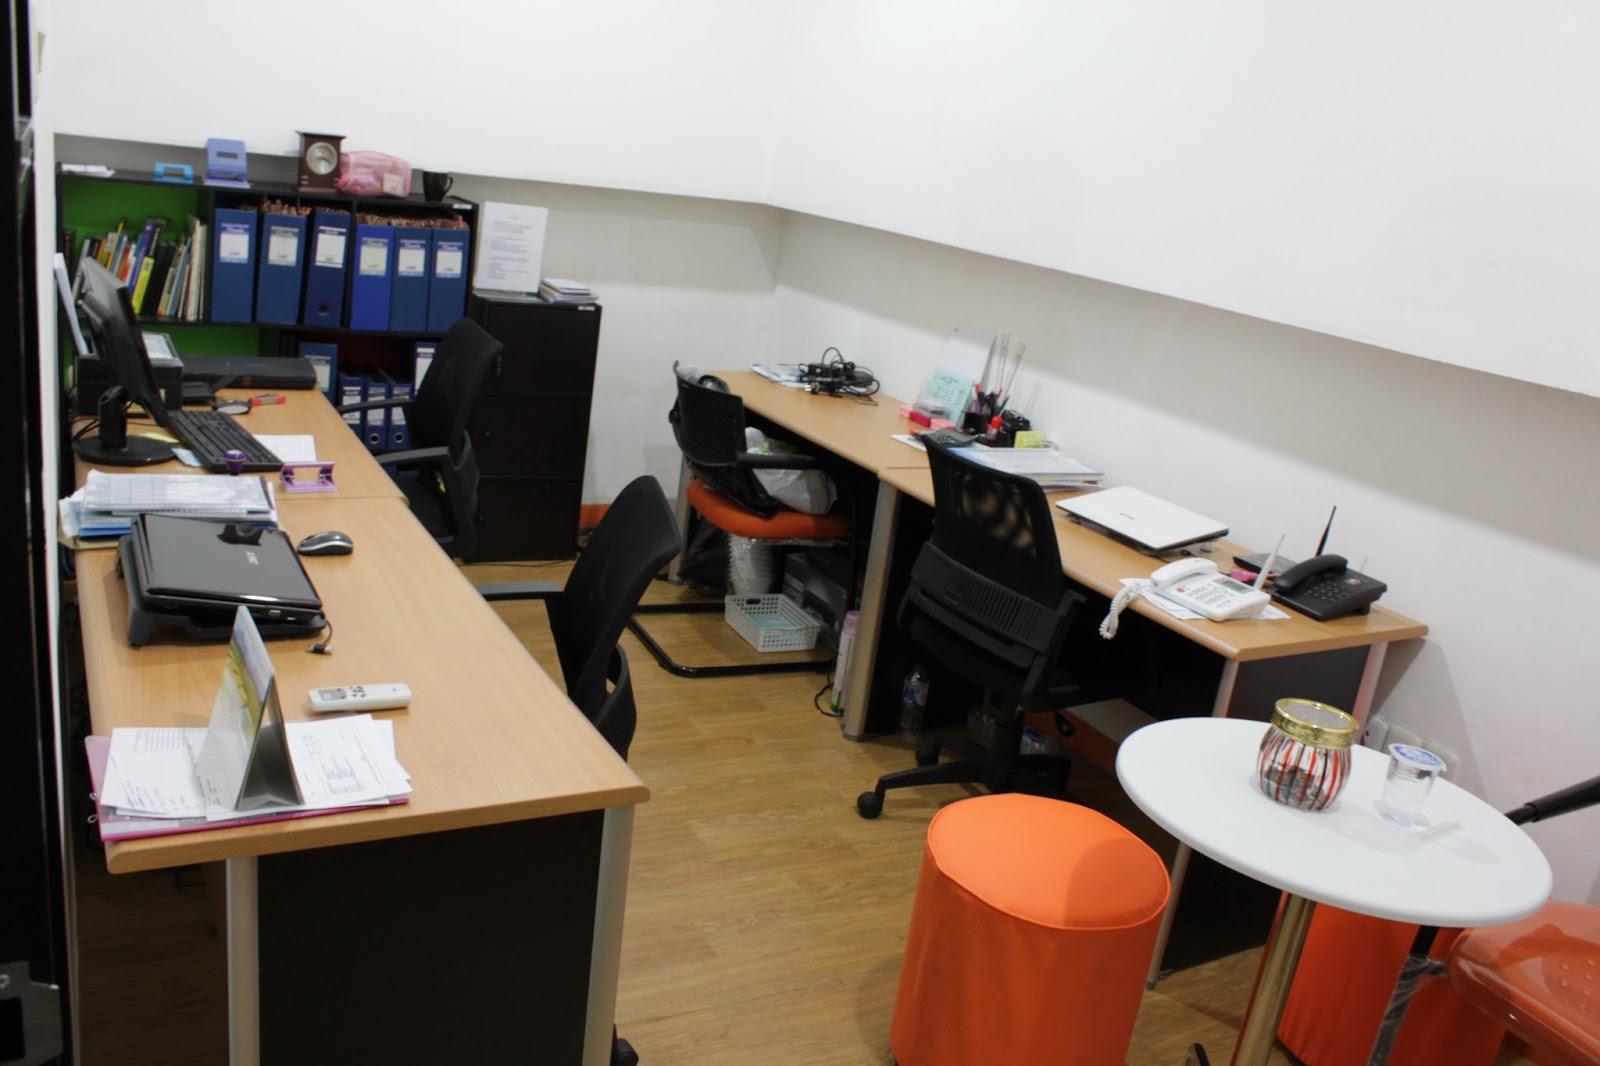 office space computer. Office Space Computer. Sewa Ruang Kantor Jakarta Murah Computer R .